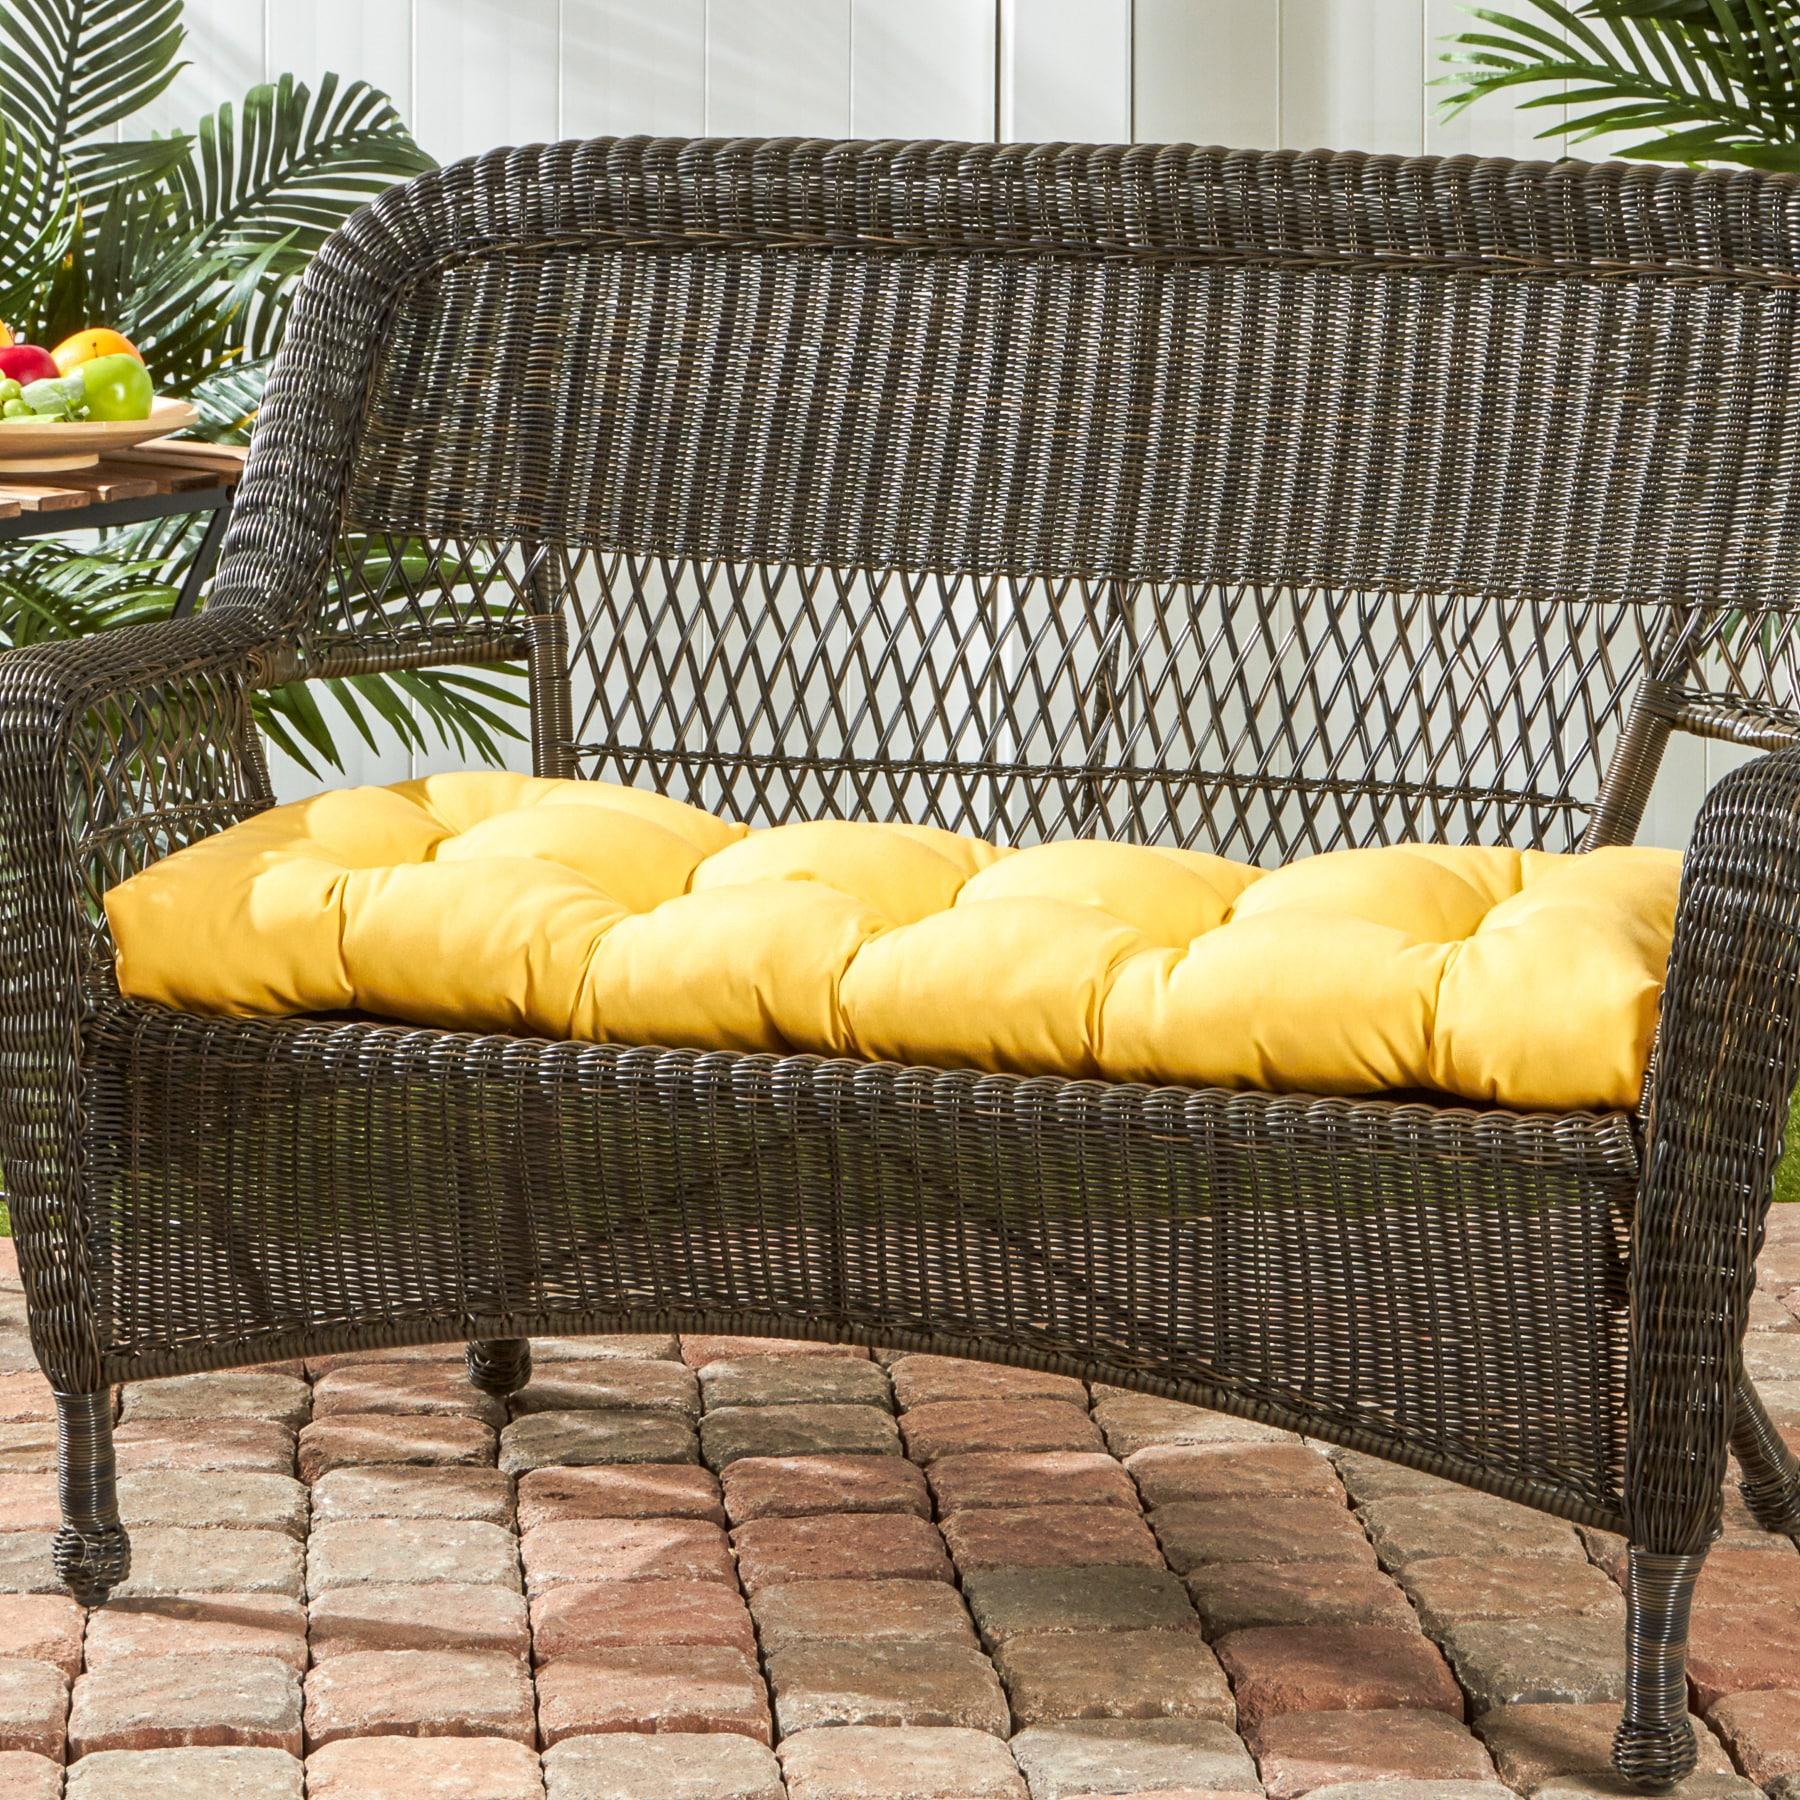 Sunbrella Outdoor Swing/ Bench Cushion